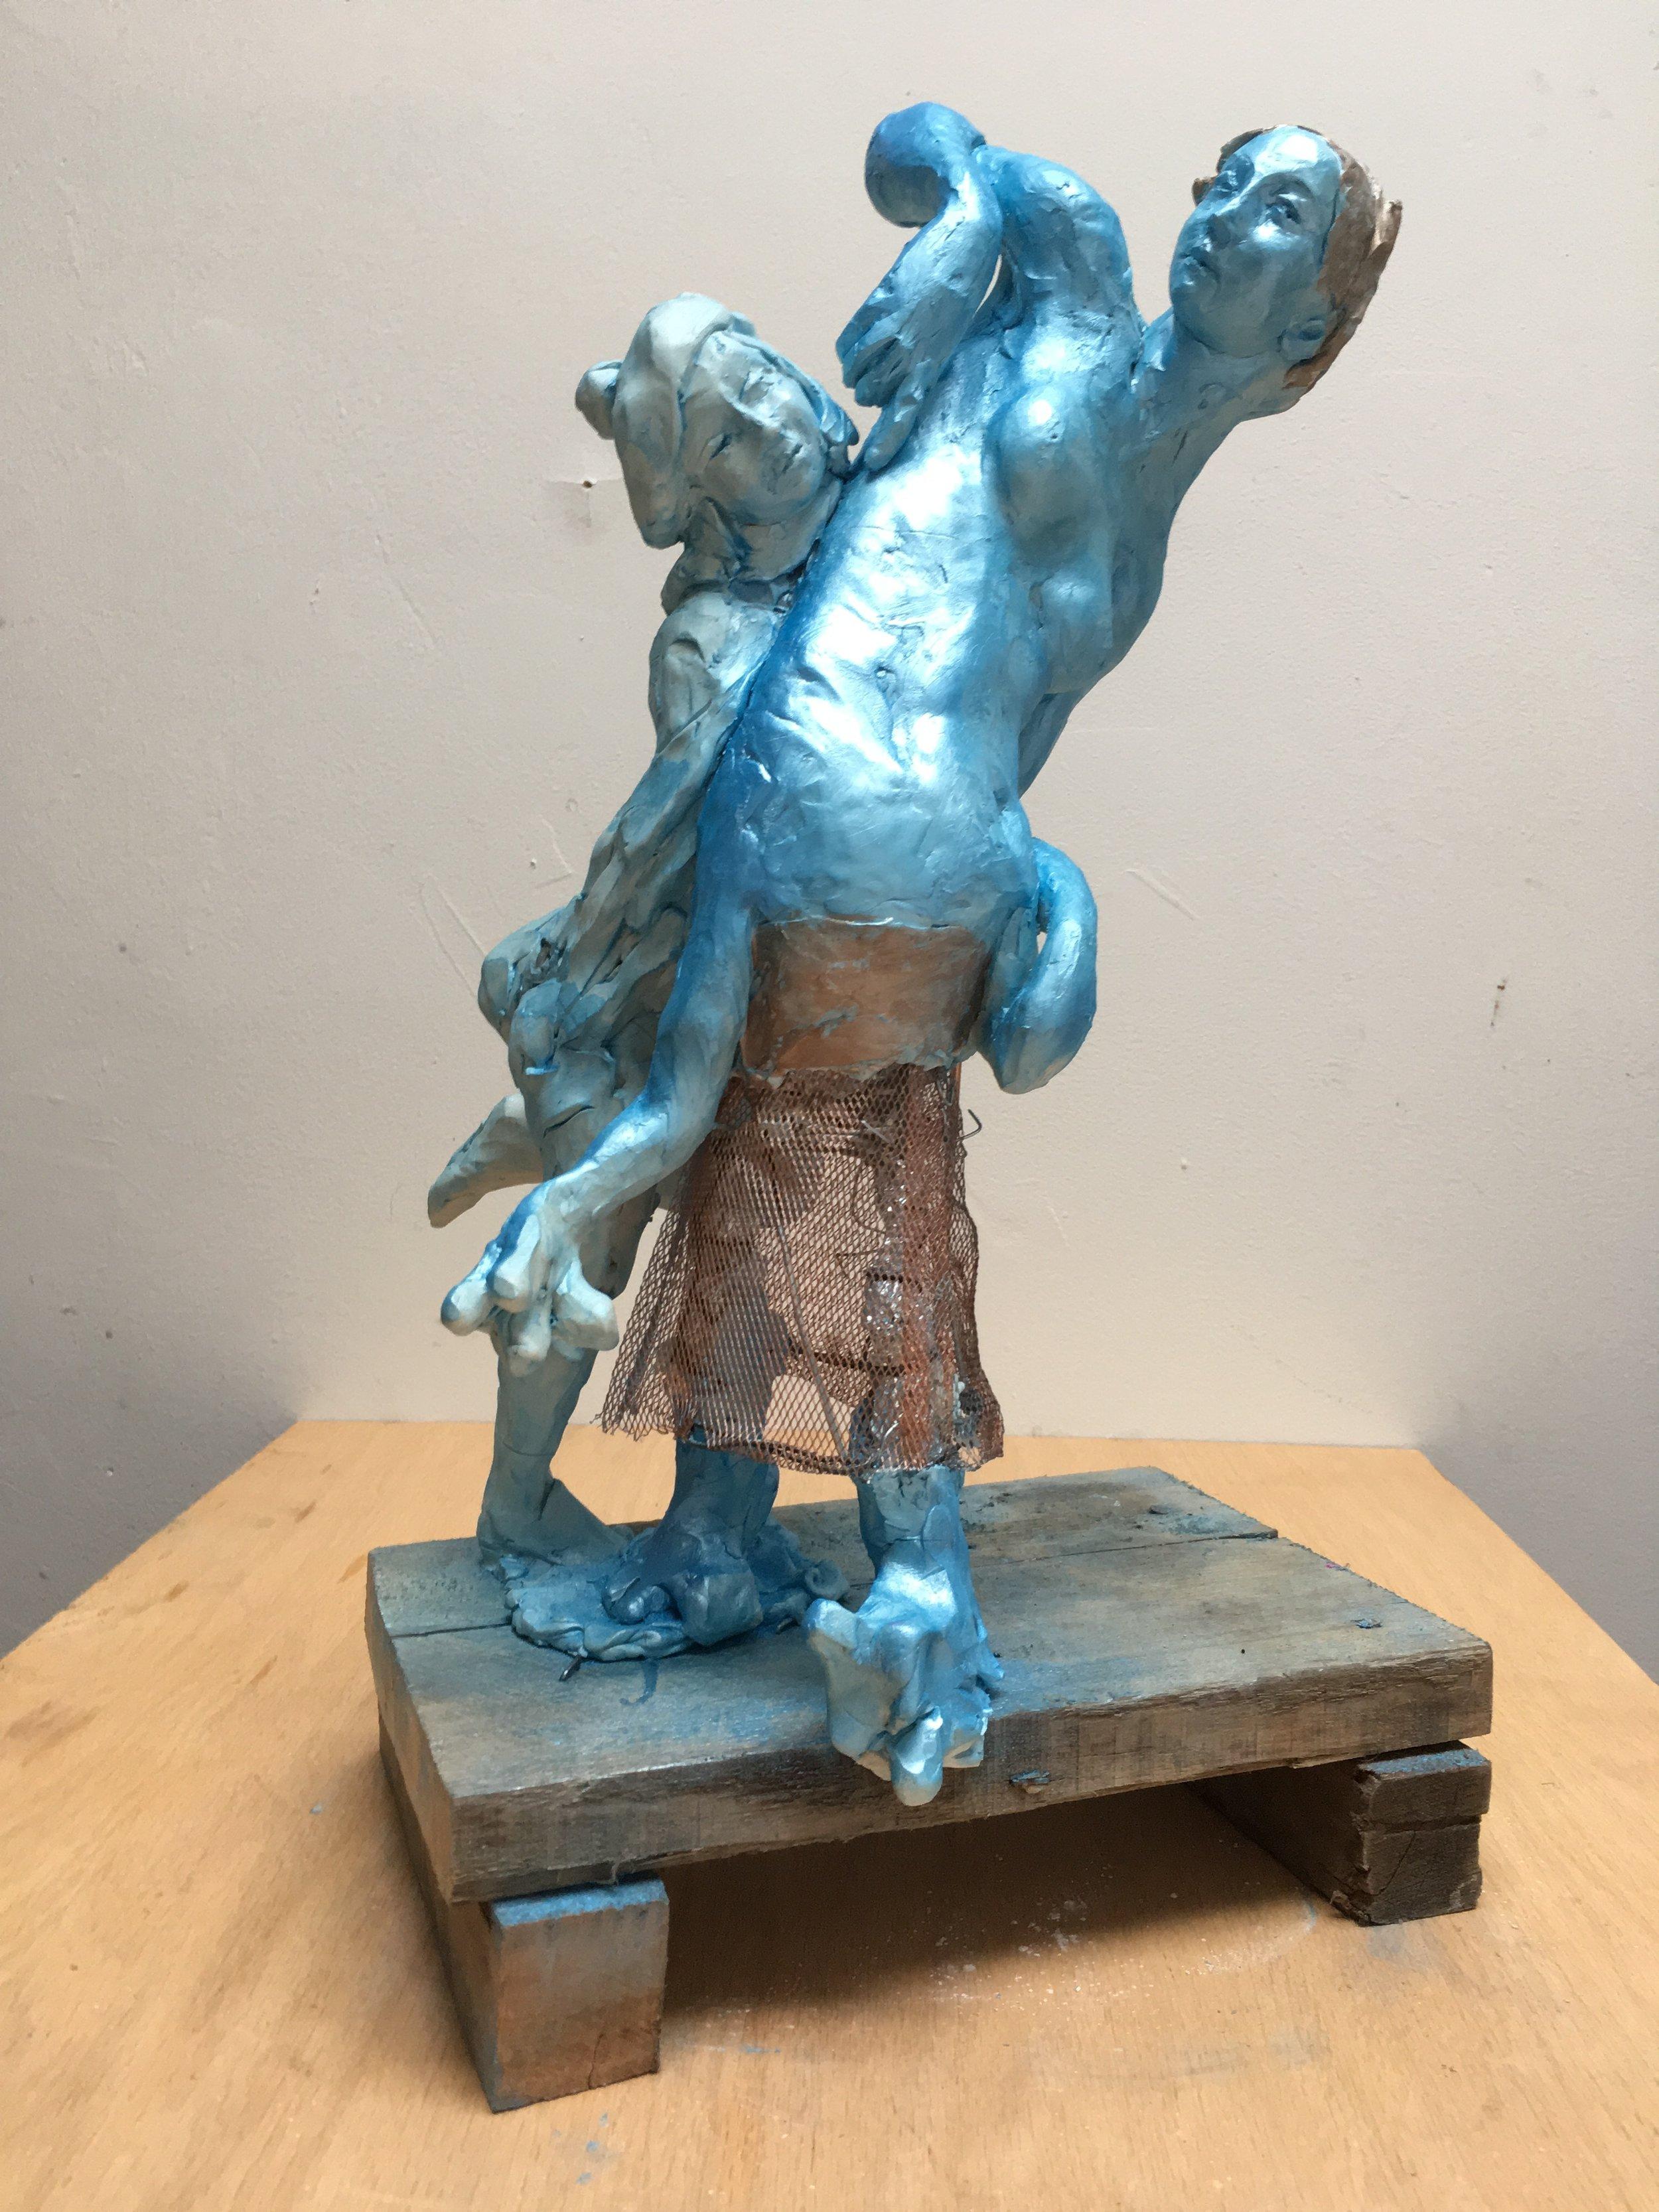 Venus and Venum, 2018 pigment, mica, reinforced polumer clay, copper, steel, on wood plinth